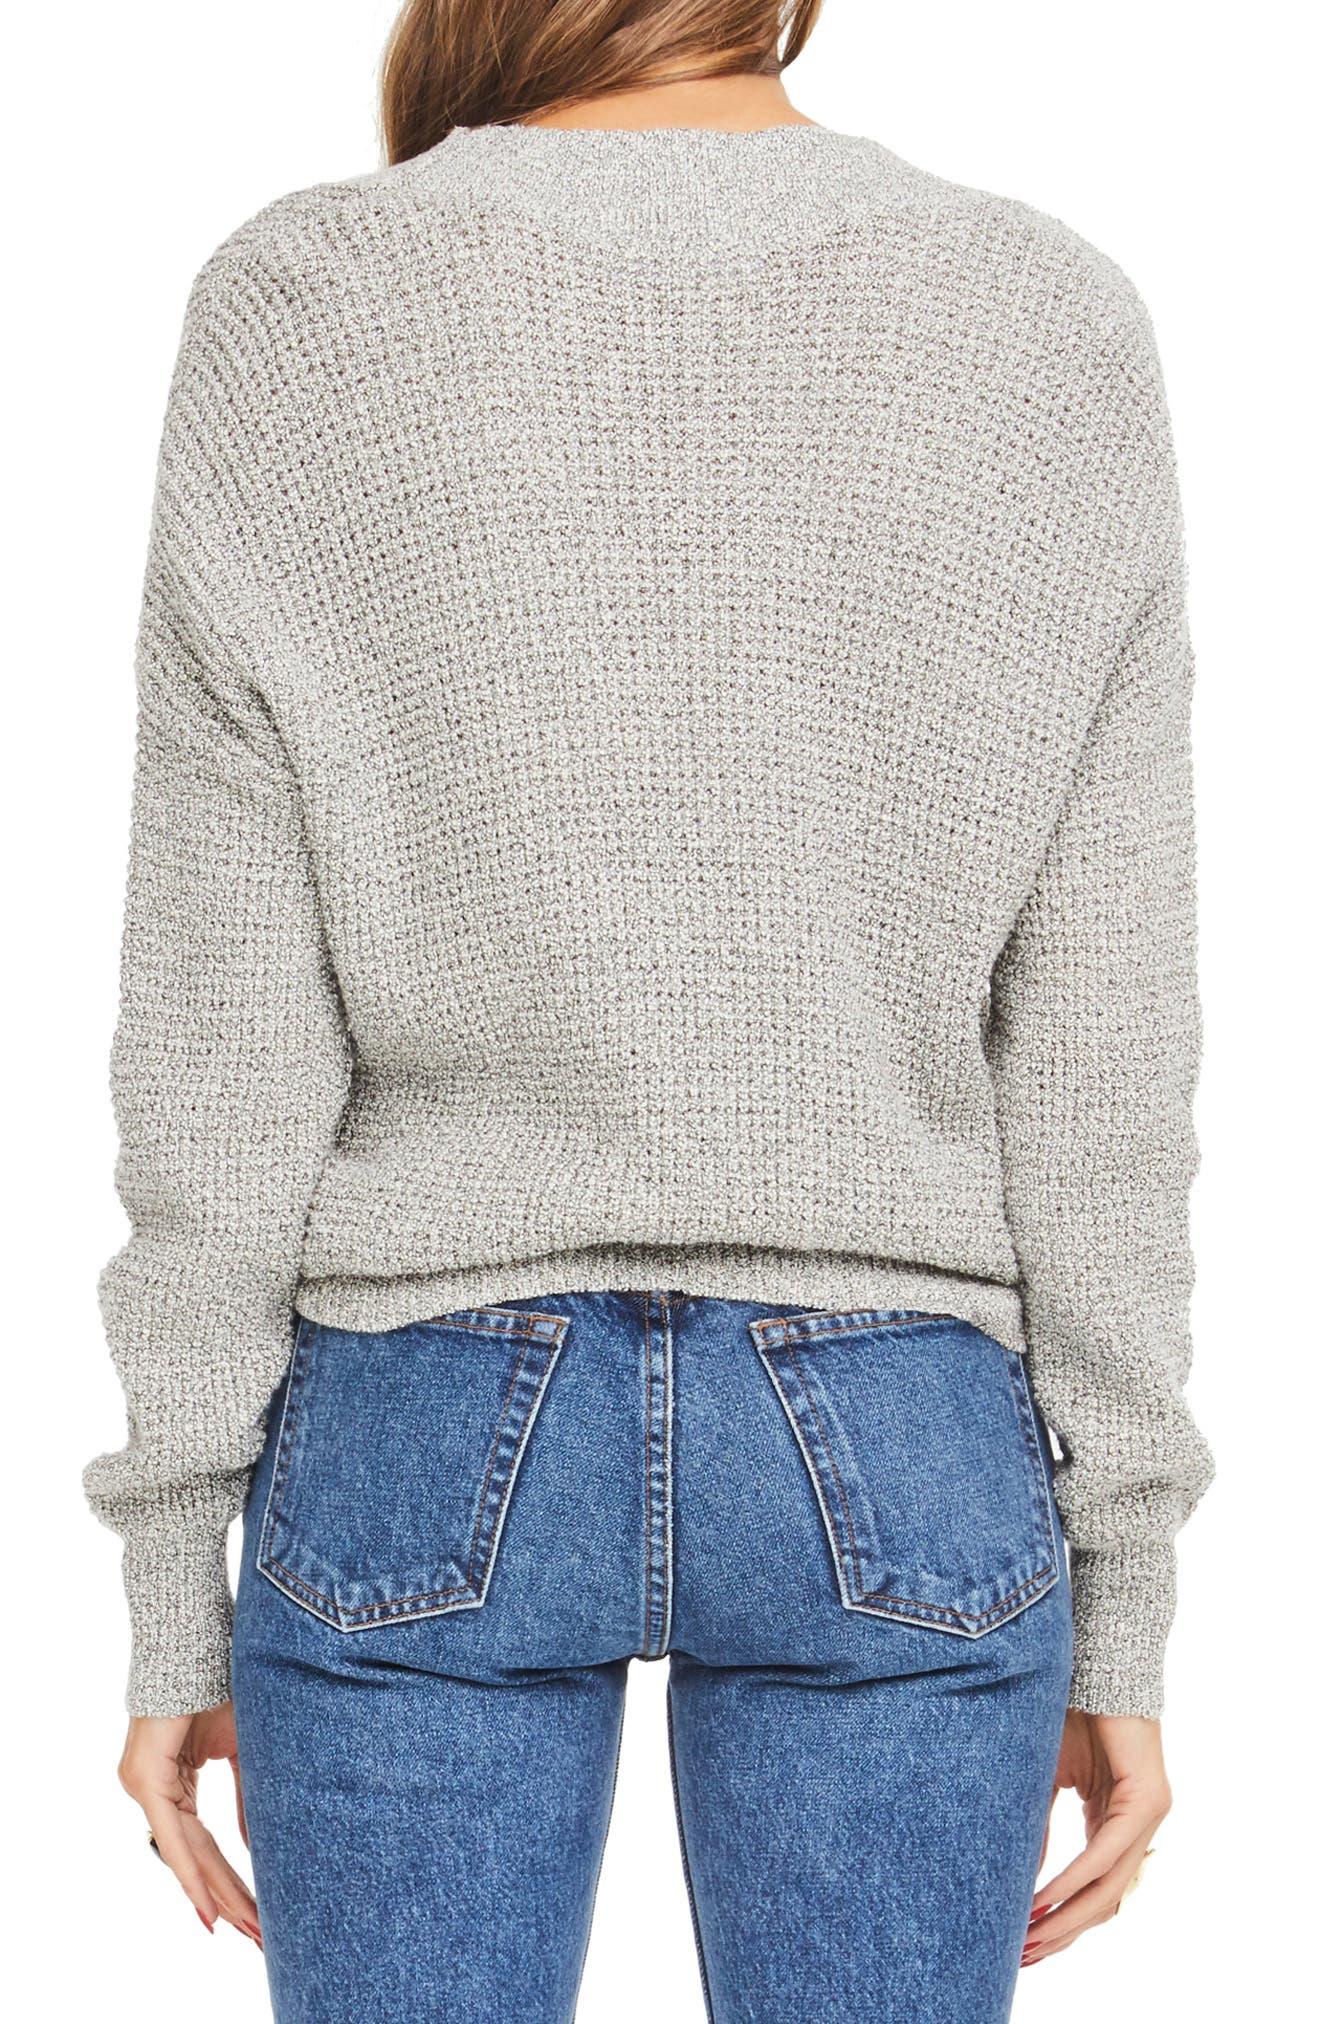 Stephanie Surplice Sweater,                             Alternate thumbnail 2, color,                             HEATHER GREY